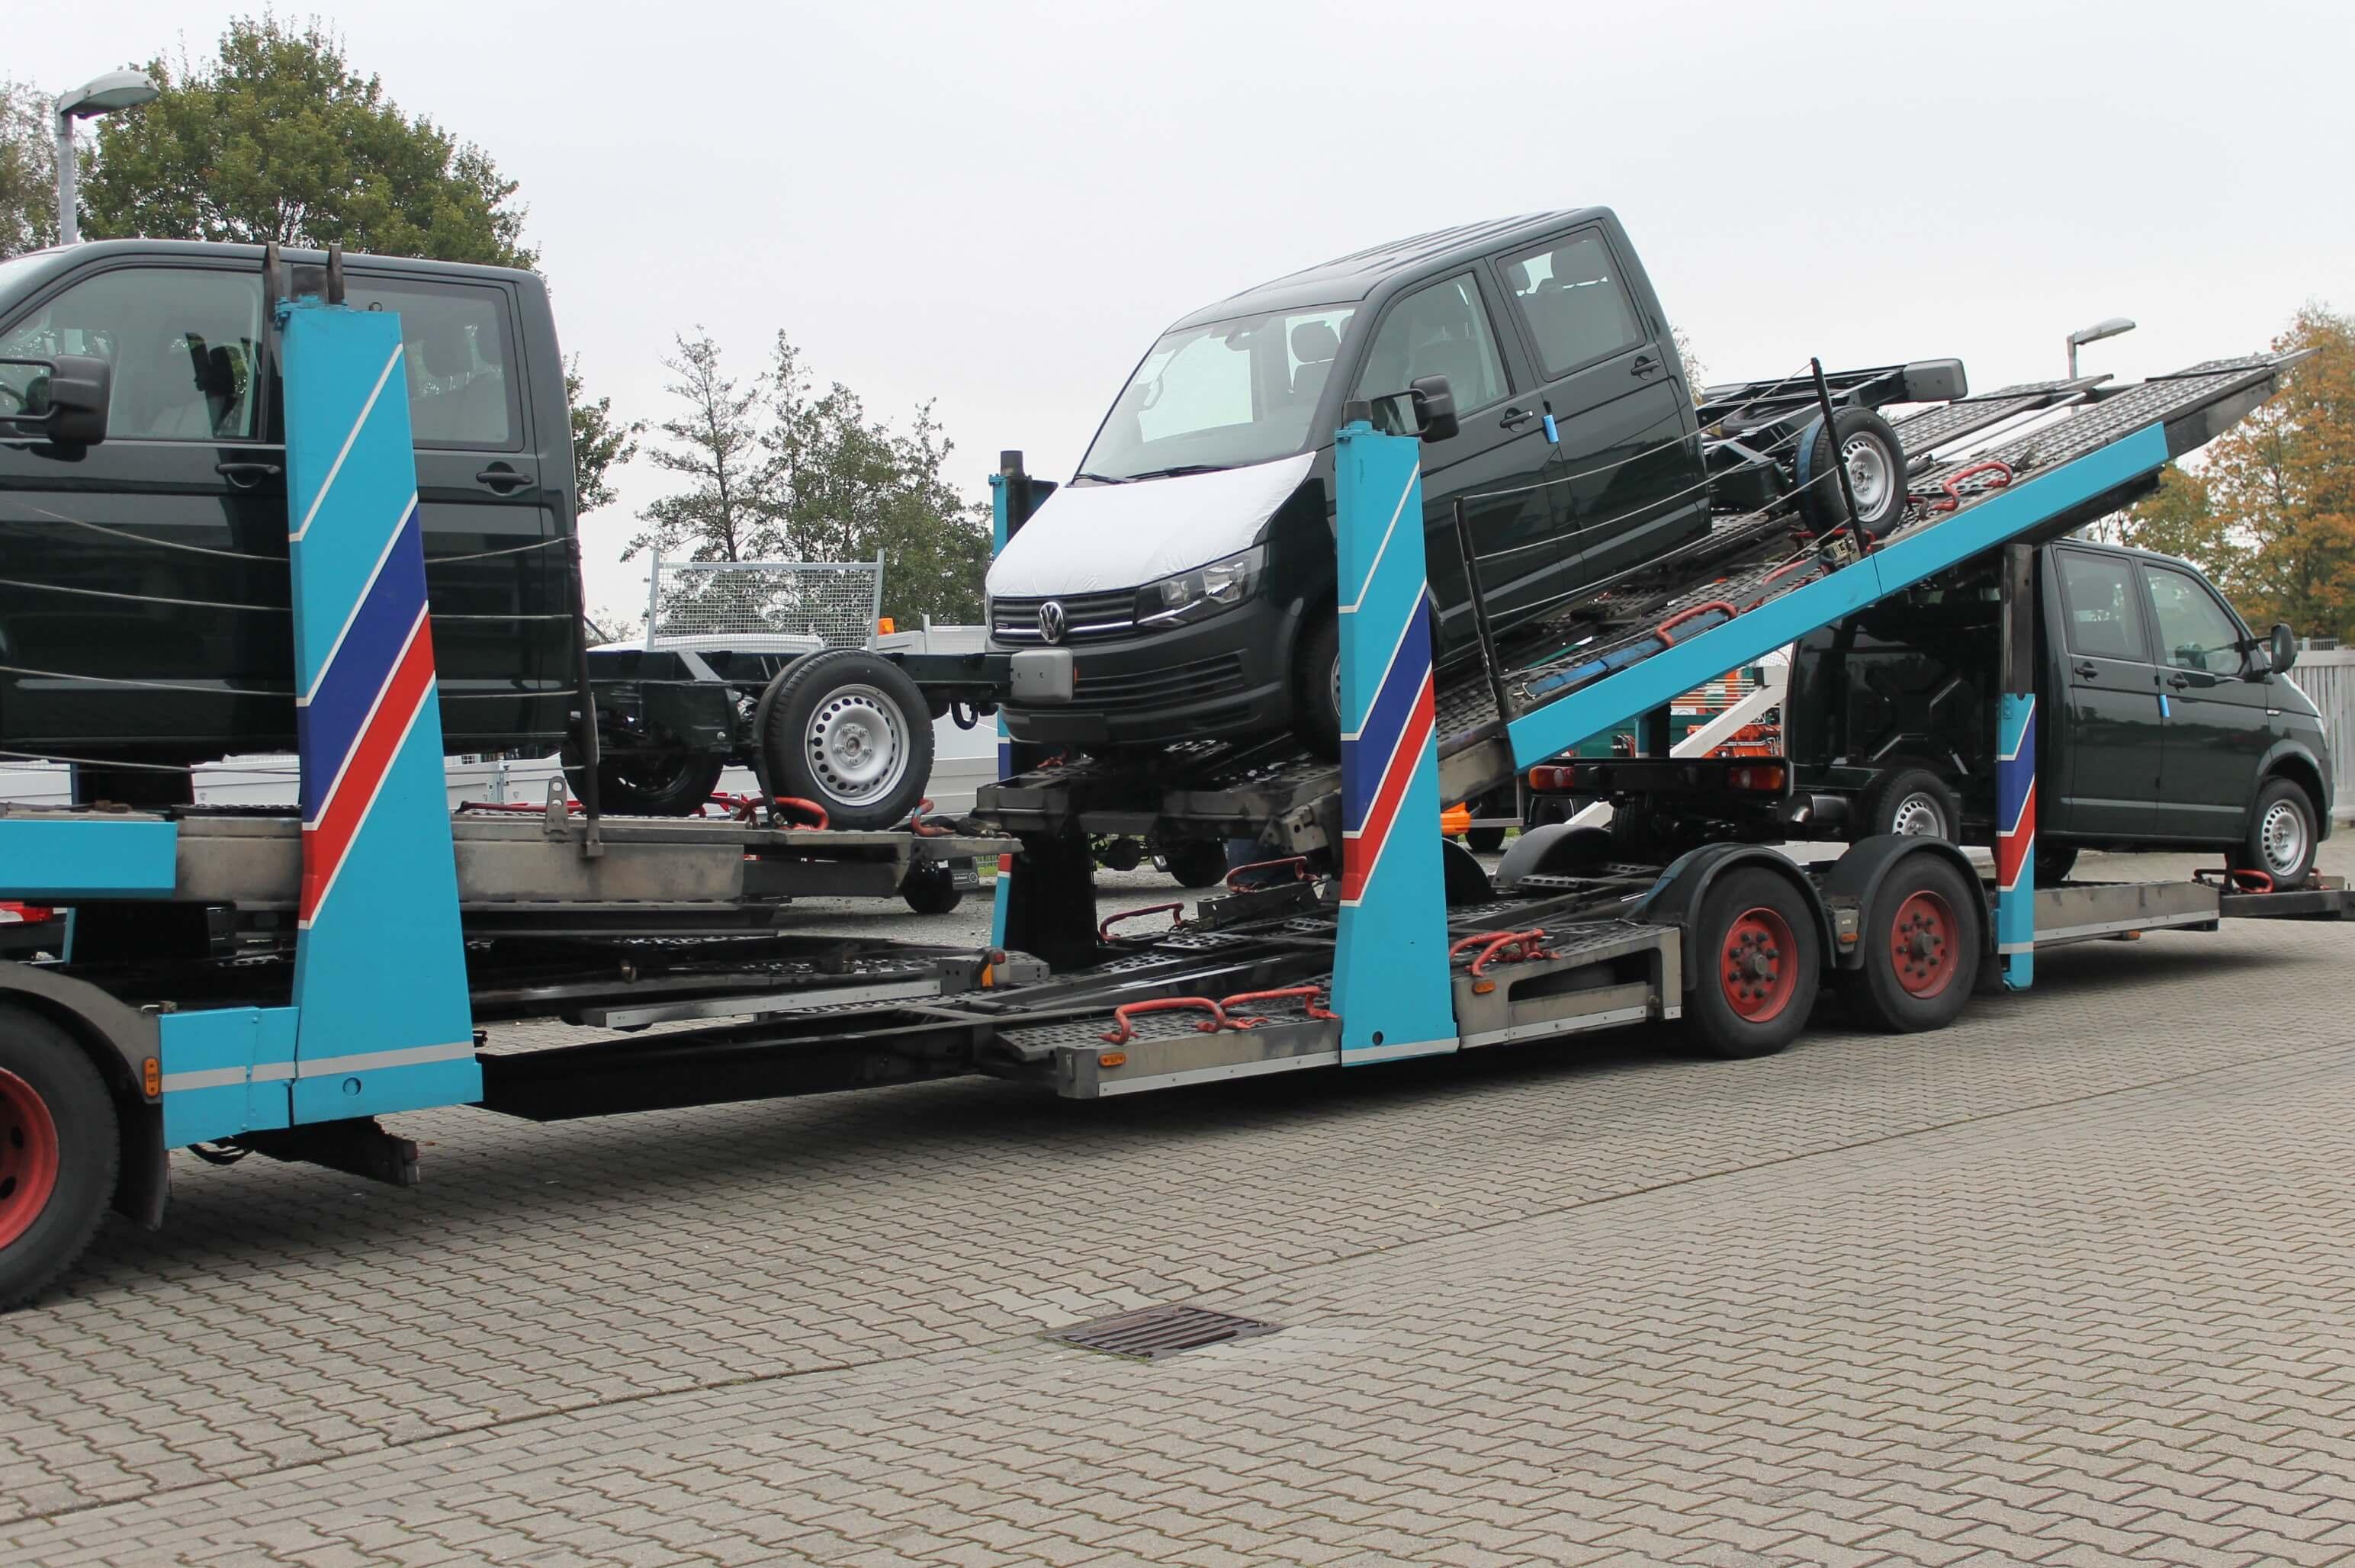 Fahrzeuganlieferung bei Schoon